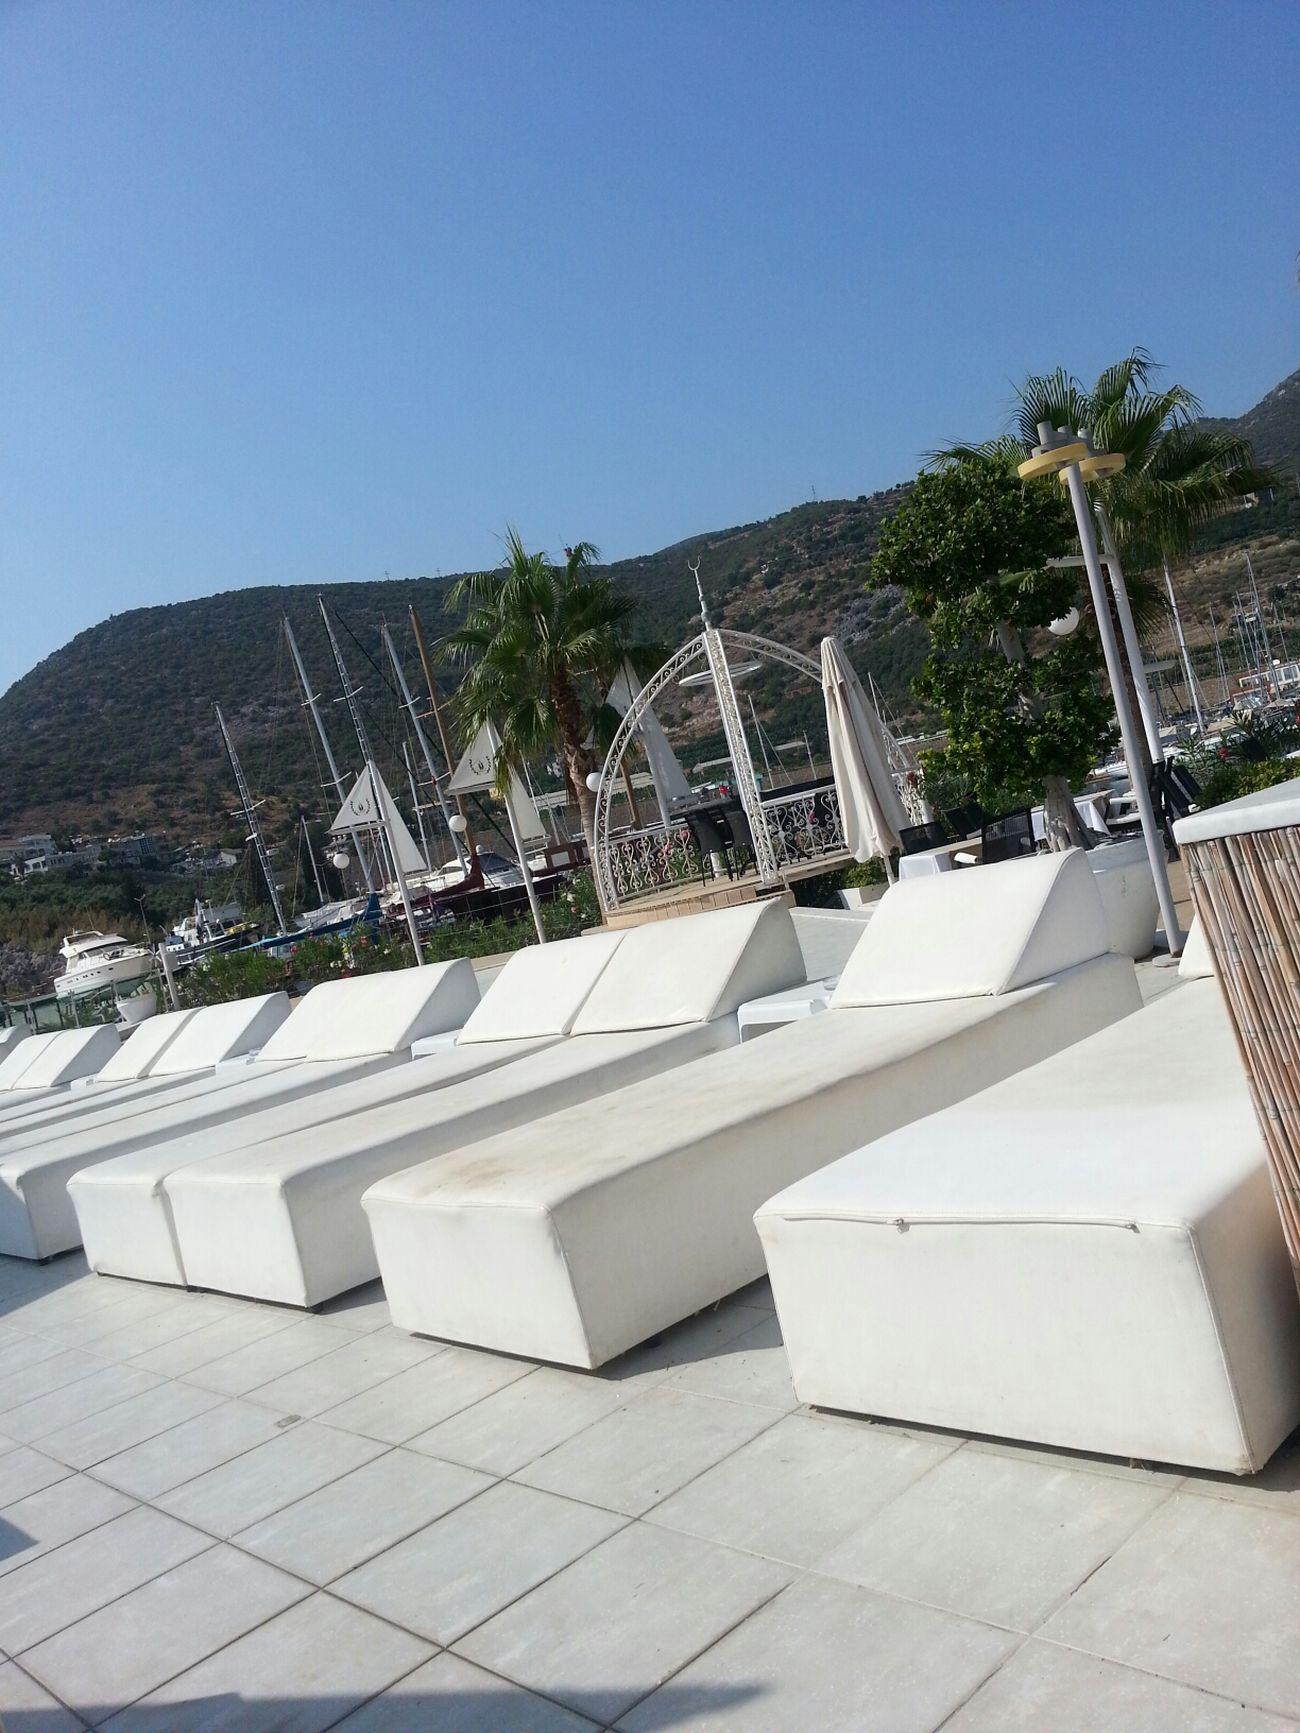 havuz keyfi :) Relaxing